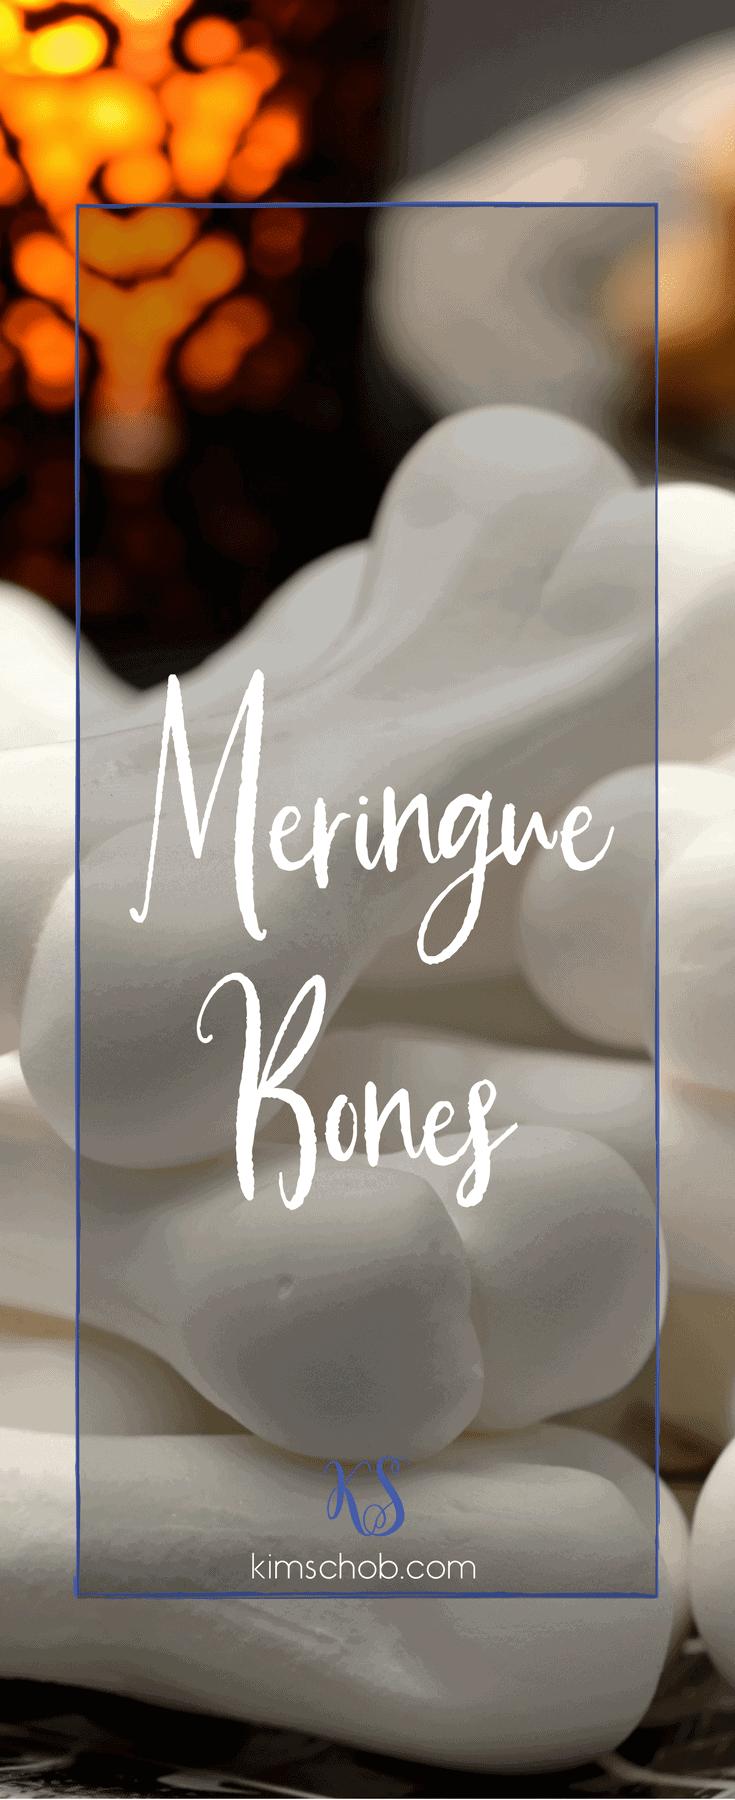 Halloween treats. Gluten-free treats. Meringue Cookies. #kimschob #meringuebones #halloween #meringue